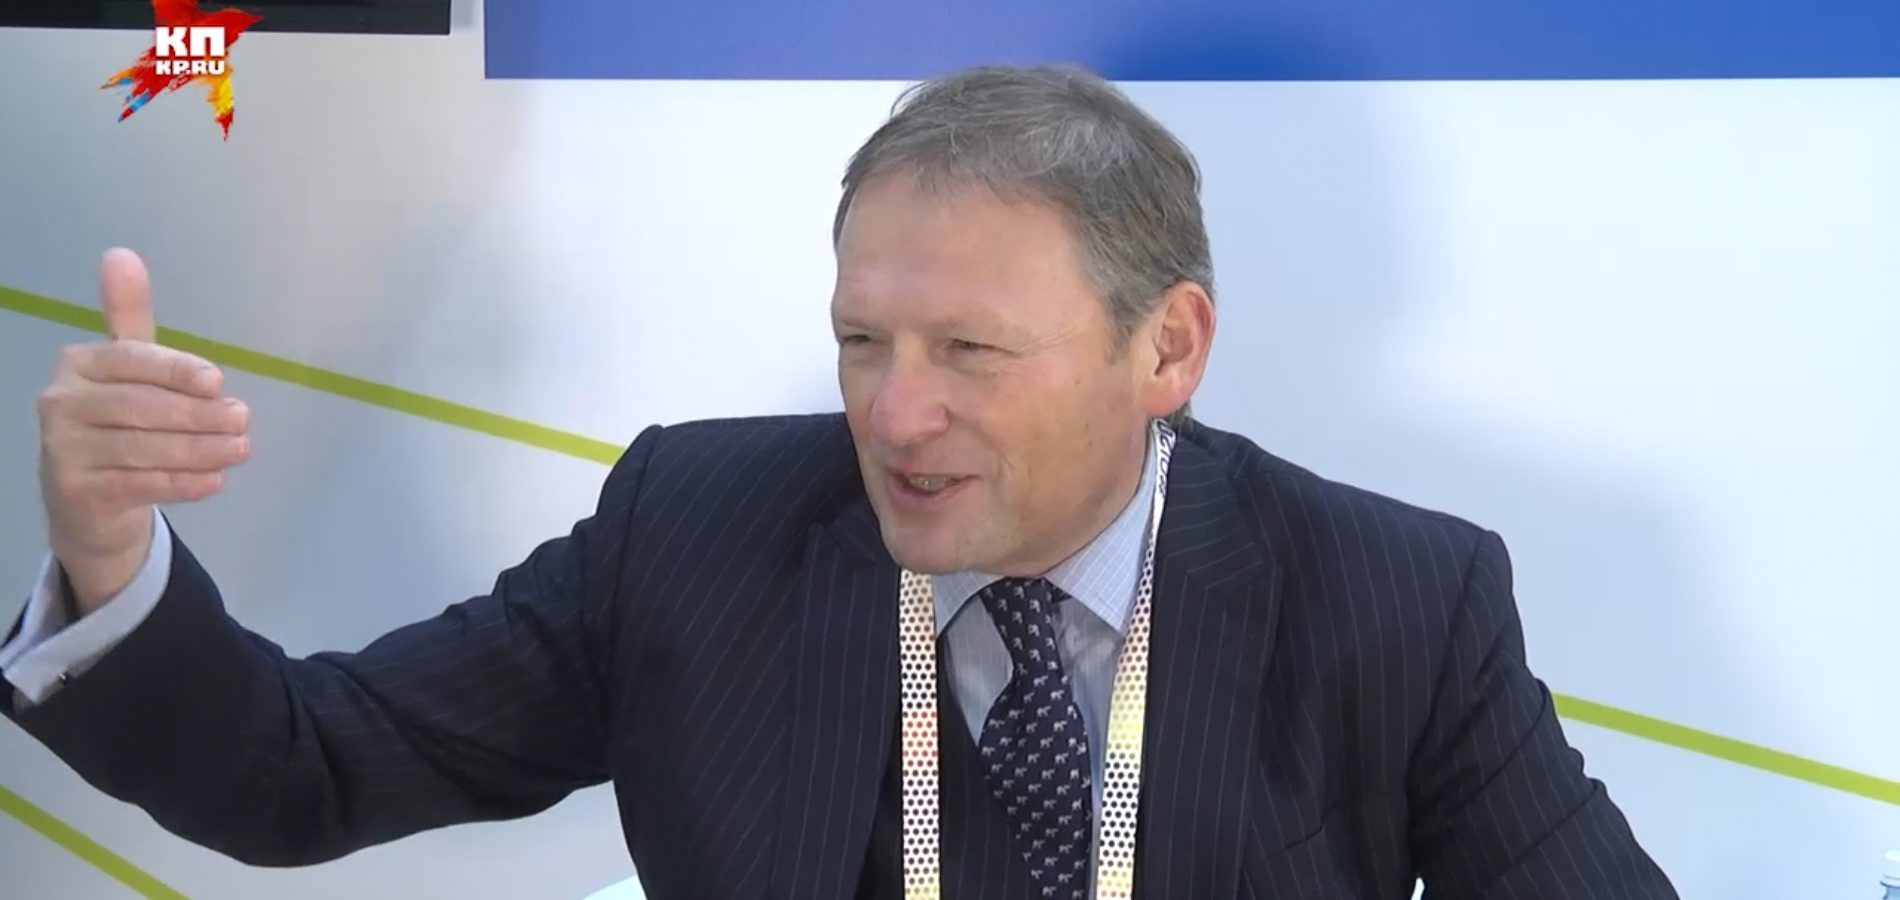 Бизнес-омбудсмен предложил отказаться от термина «криптовалюта»